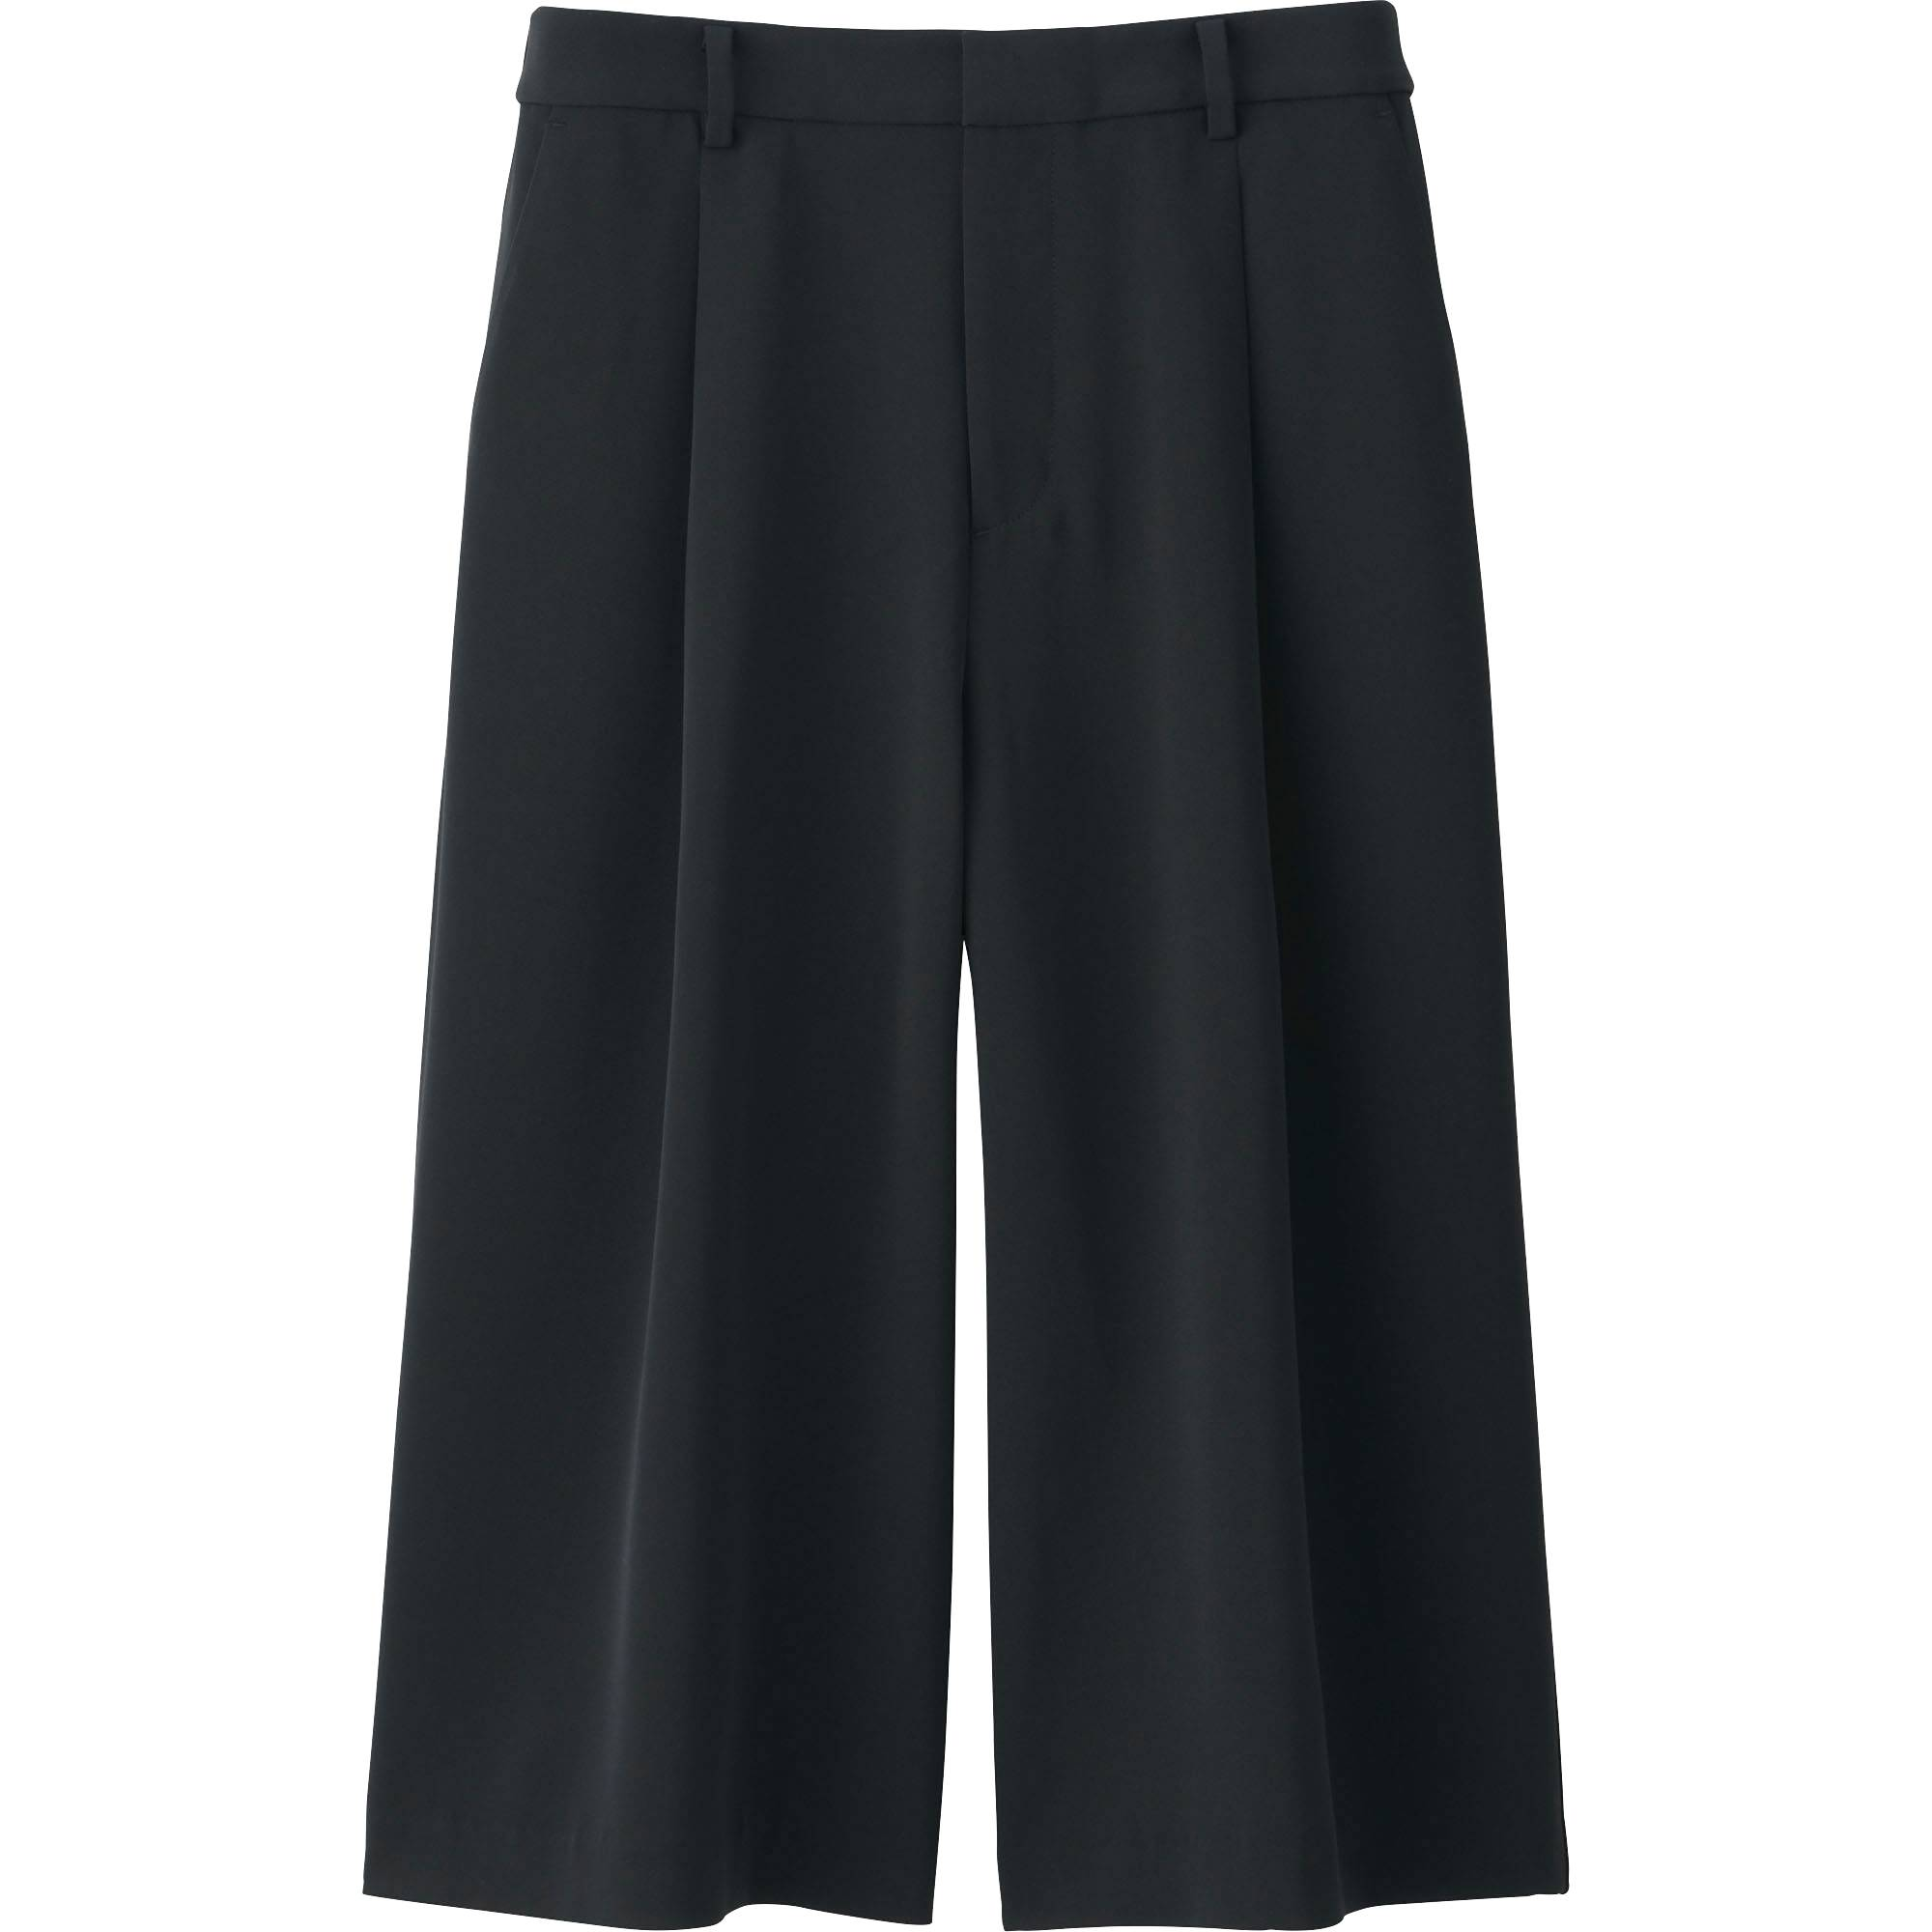 Women's Draped Gaucho Pants | UNIQLO US